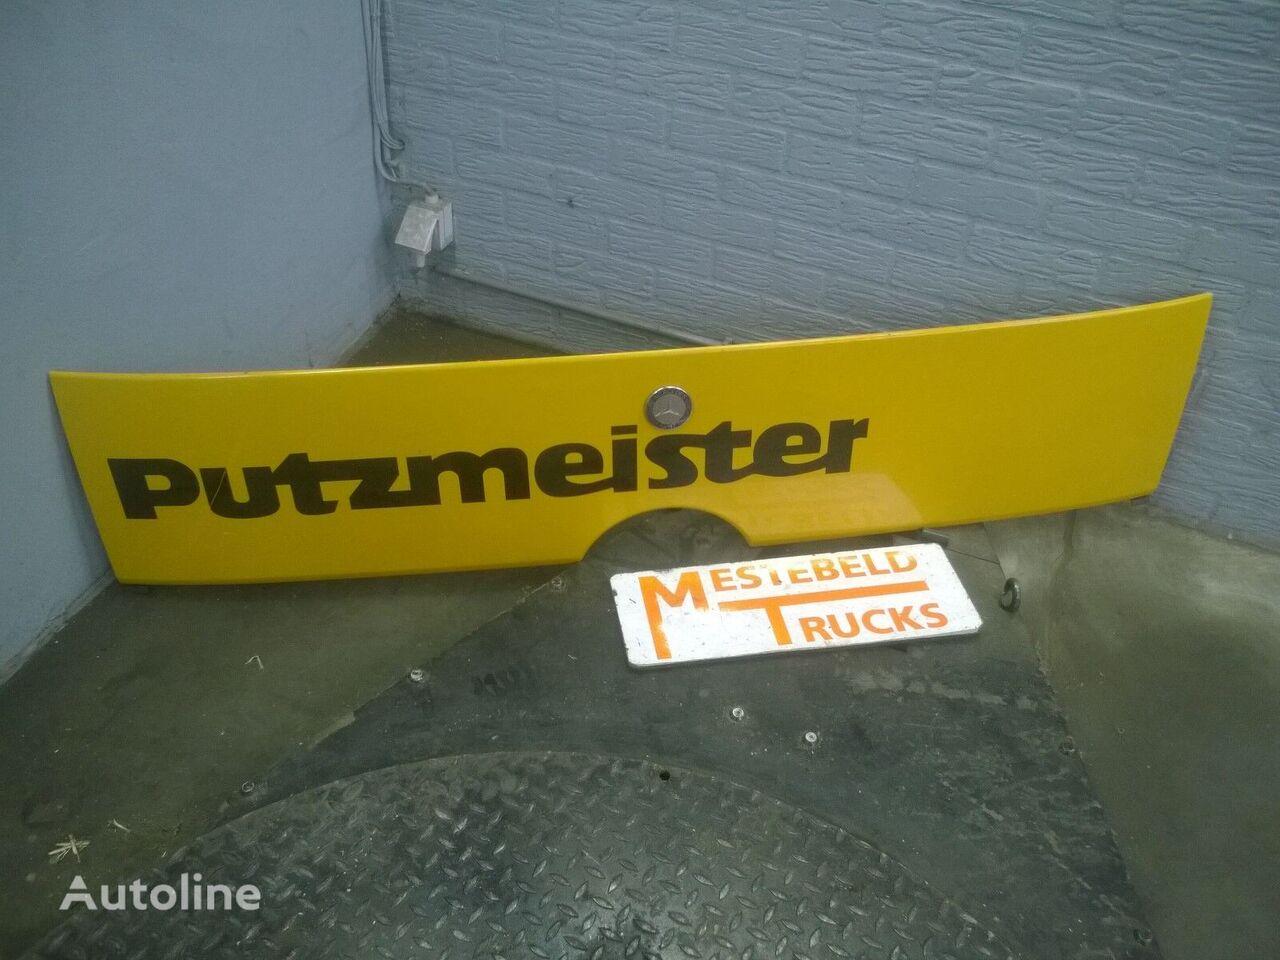 облицовка MERCEDES-BENZ для тягача MERCEDES-BENZ Frontplaat boven grille